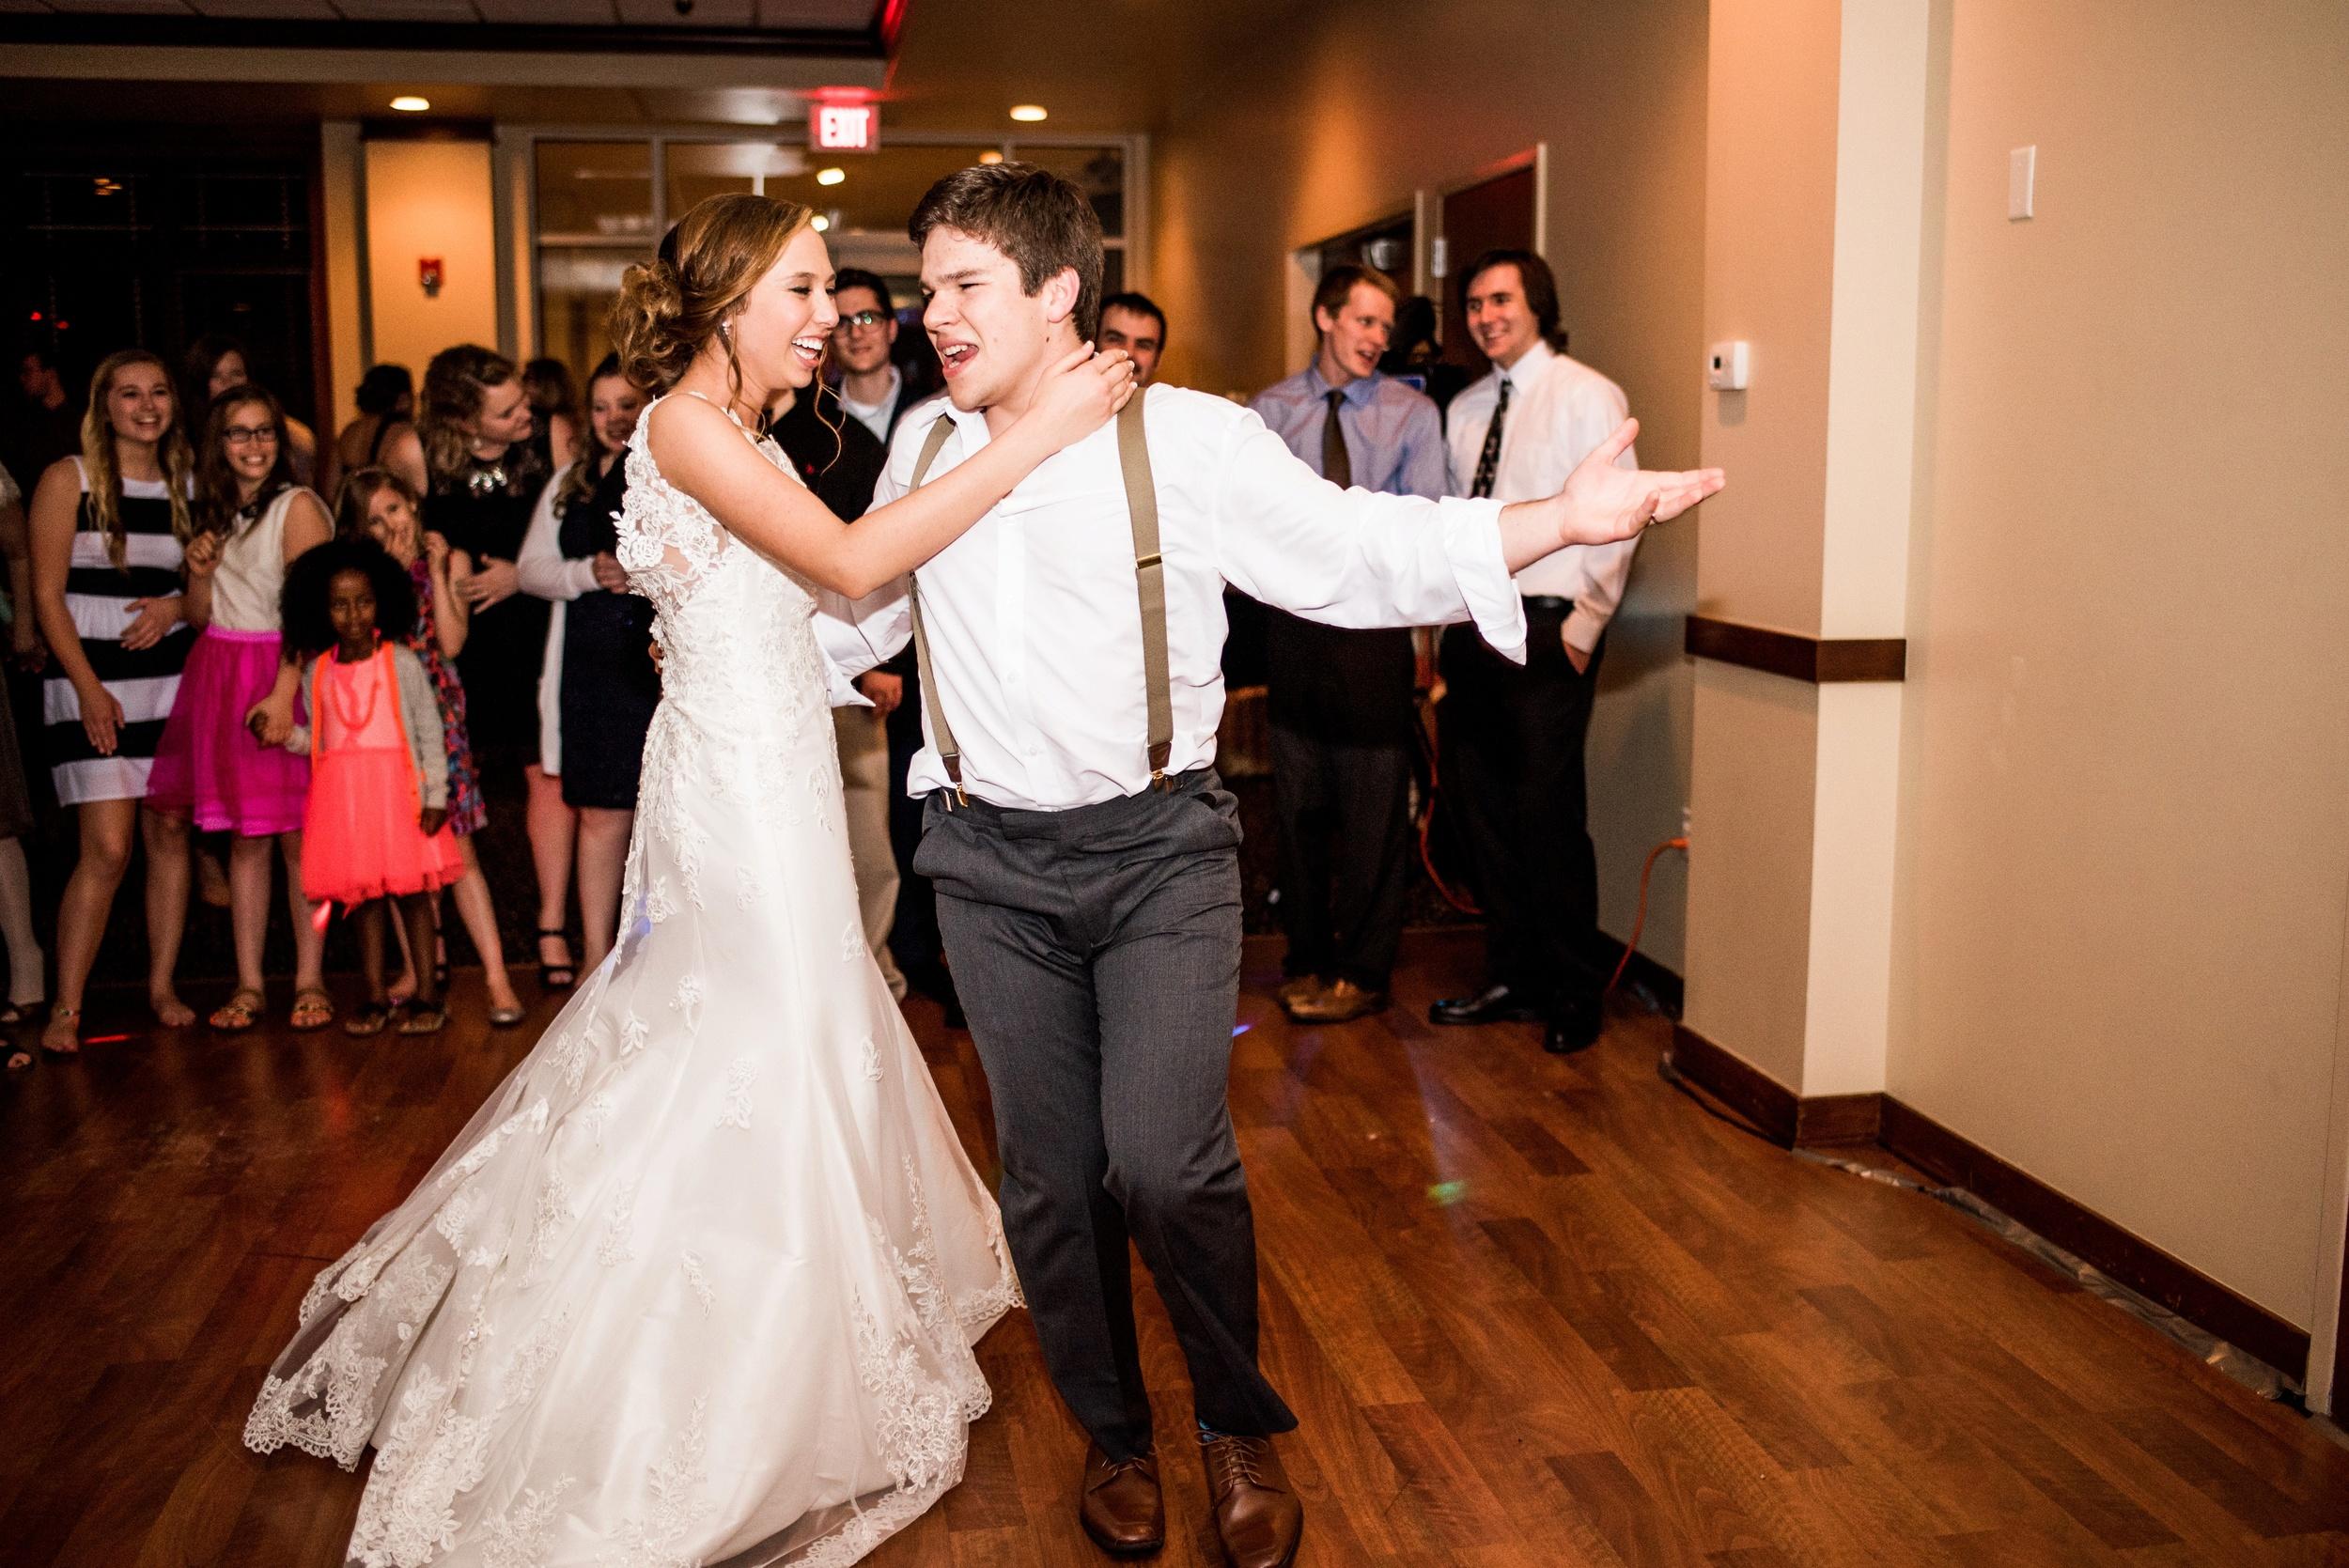 Pleasant Hill Des Moines Wedding Photographer_2200.jpg